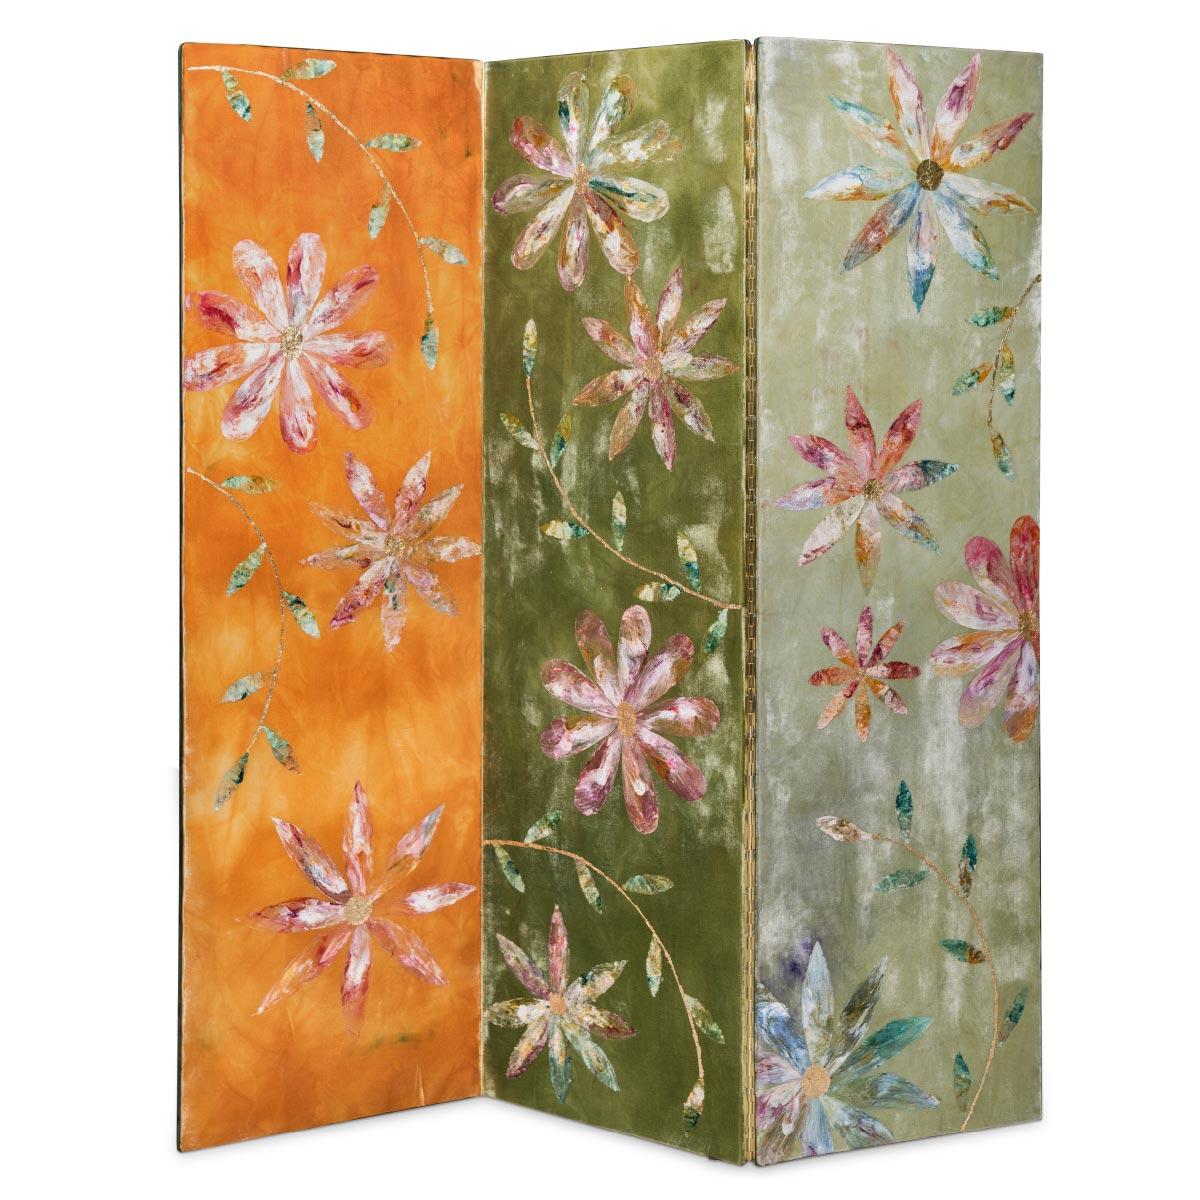 Screen Flower Labyrinth Velvet Gold Foil Silk Wood Anna Paola Cibin Italiano Plurale artist